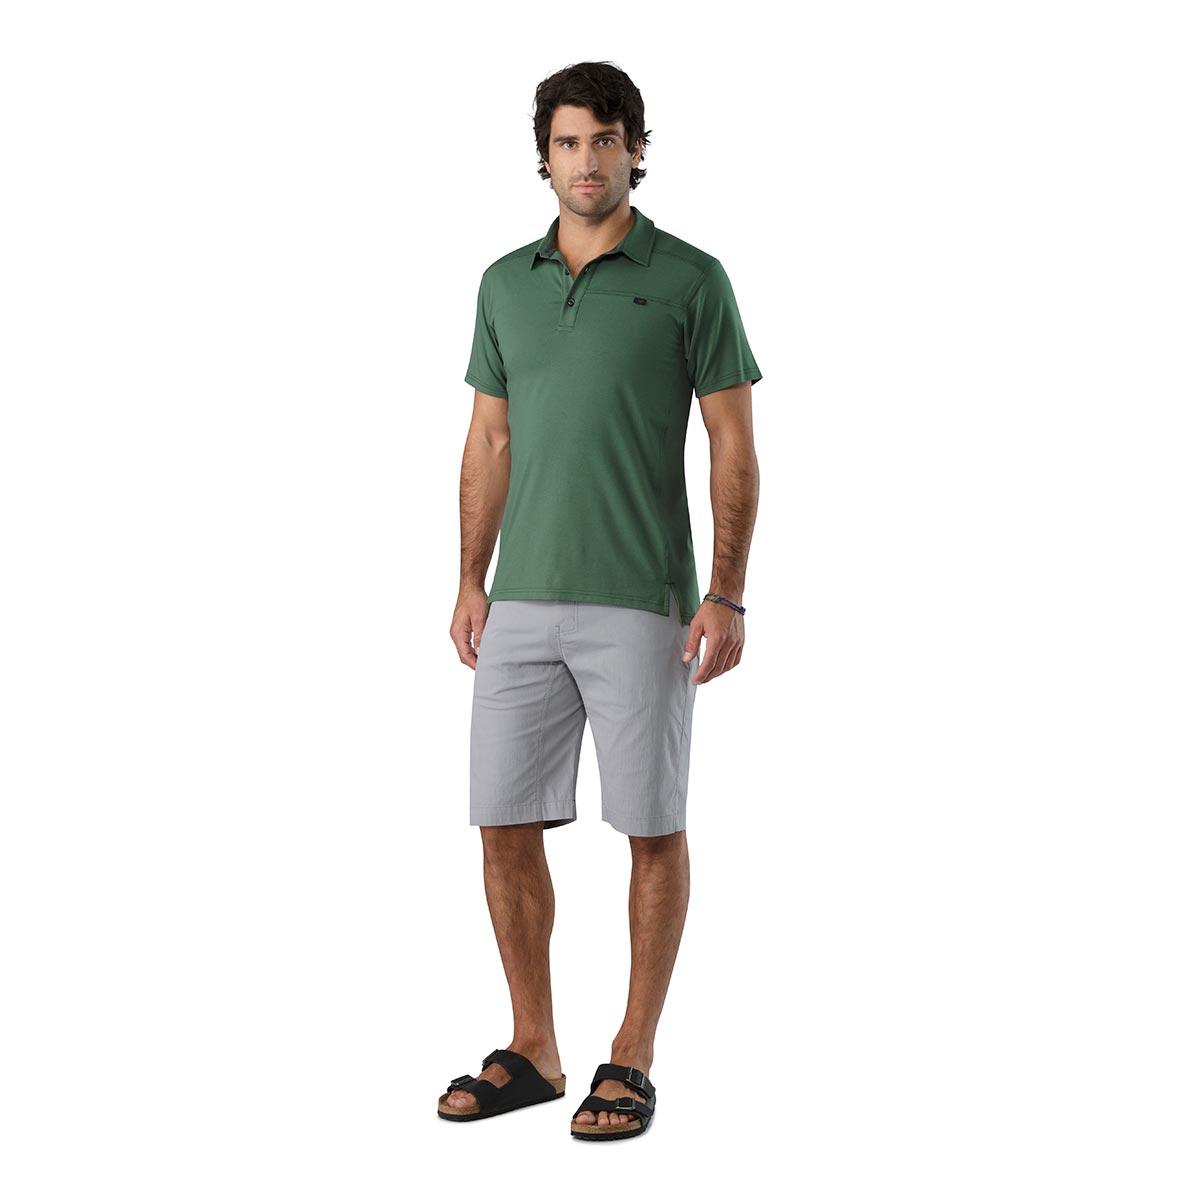 Arcteryx Captive Ss Polo Mens Urban Shirts Mens Tops And